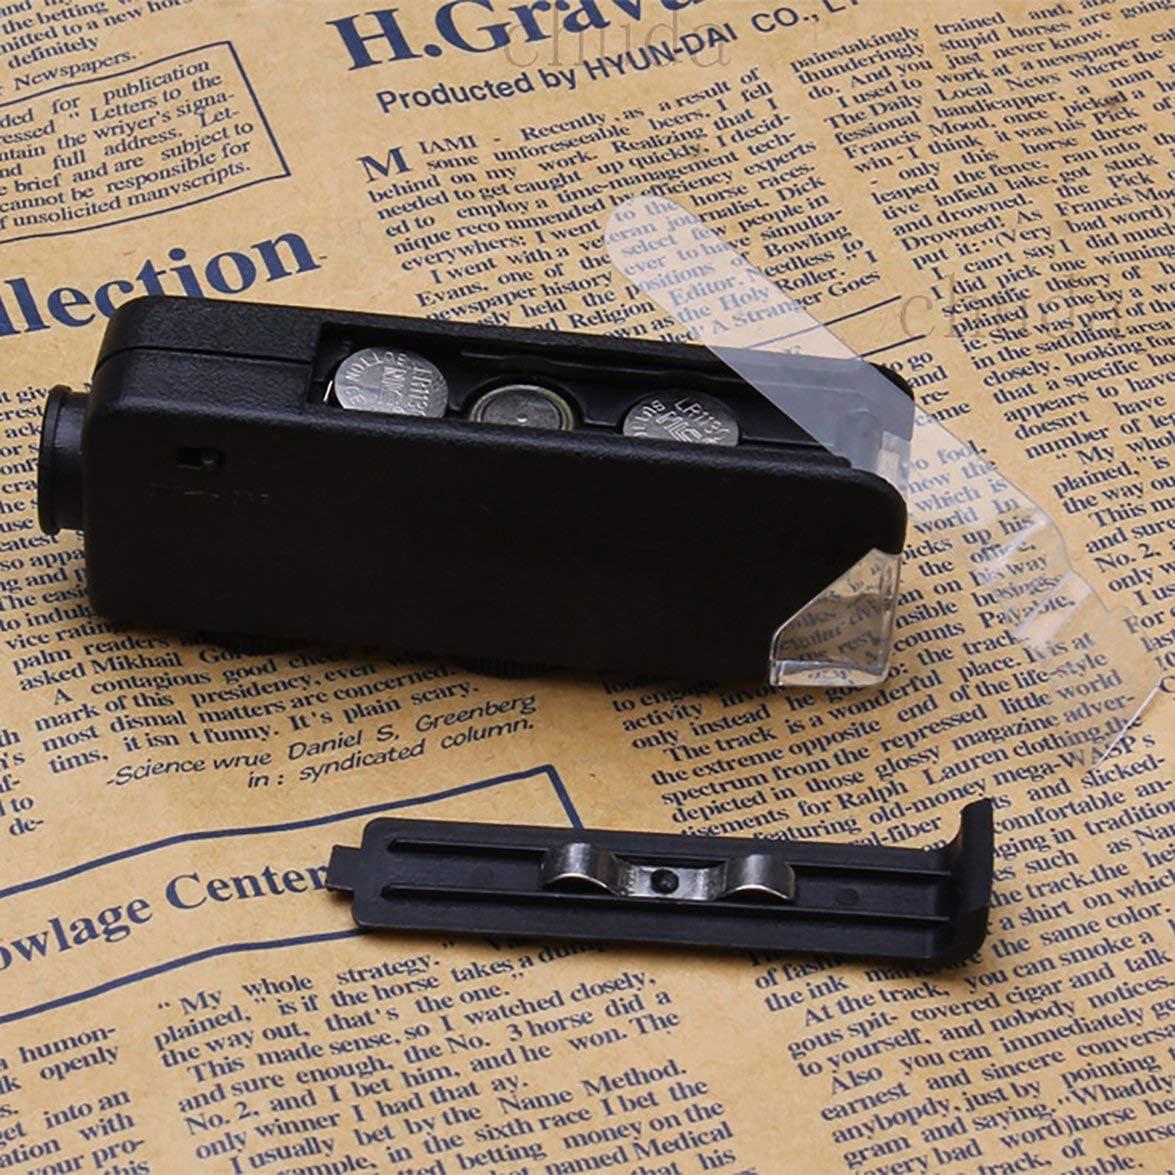 Pandamama Portable 60x-100x Illuminated Zoom Pocket Microscope Magnifier Loupe Manual Adjustment Focus for Perfect Vision